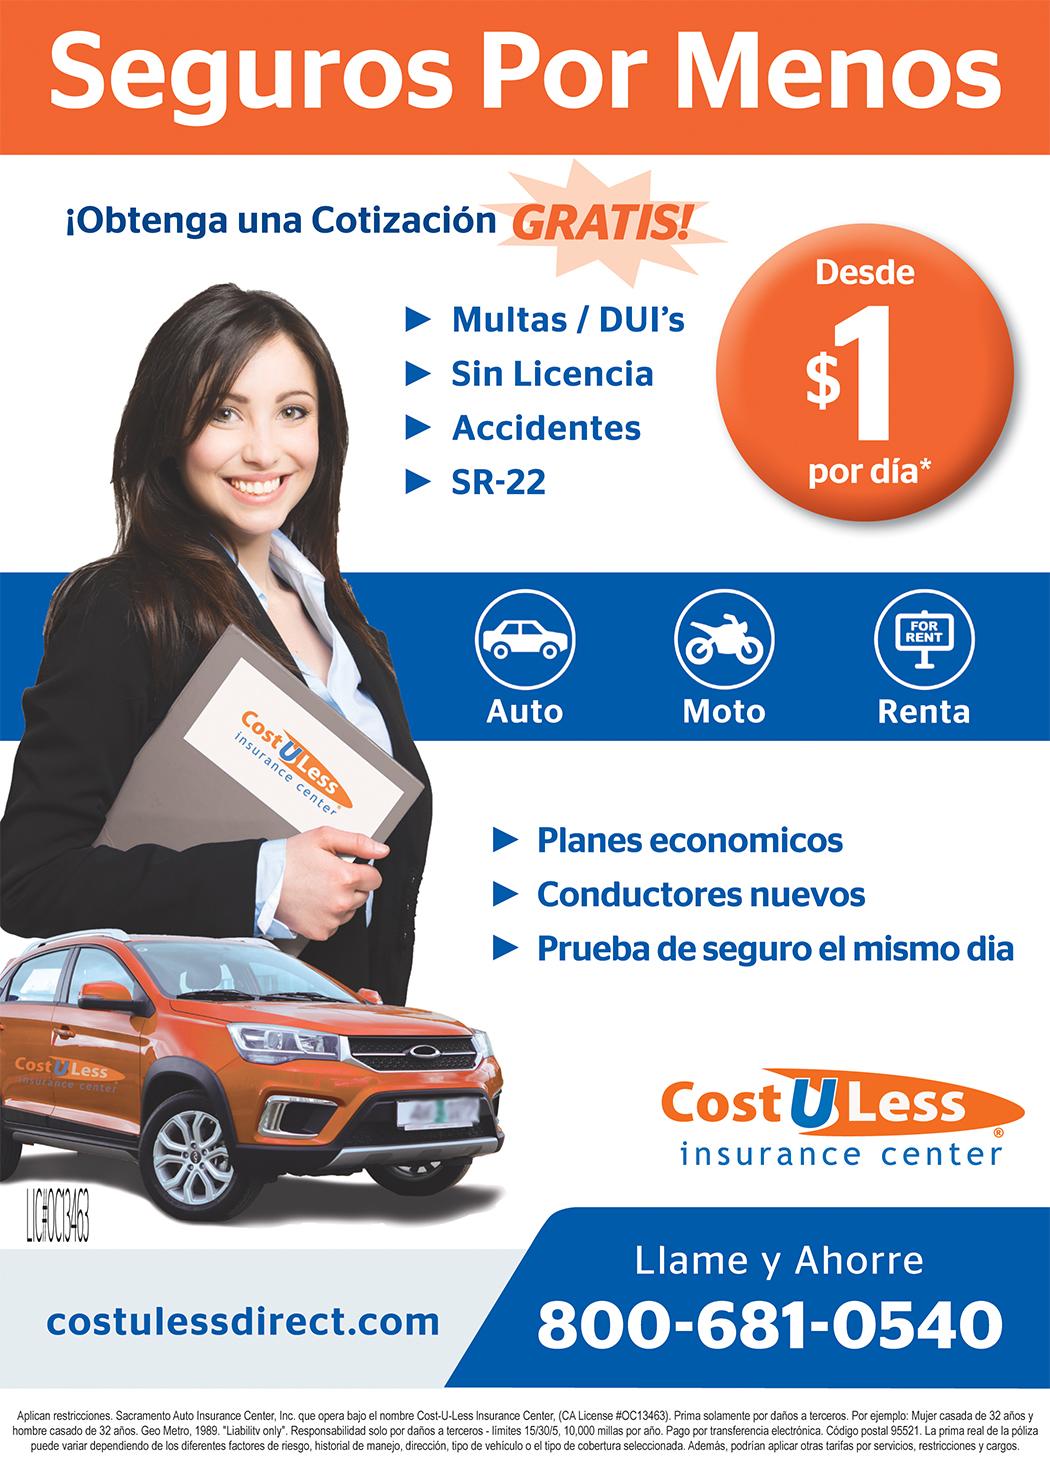 Cost U Less Insurance 1 Pag FEBRERO 2019-01 copy.jpg